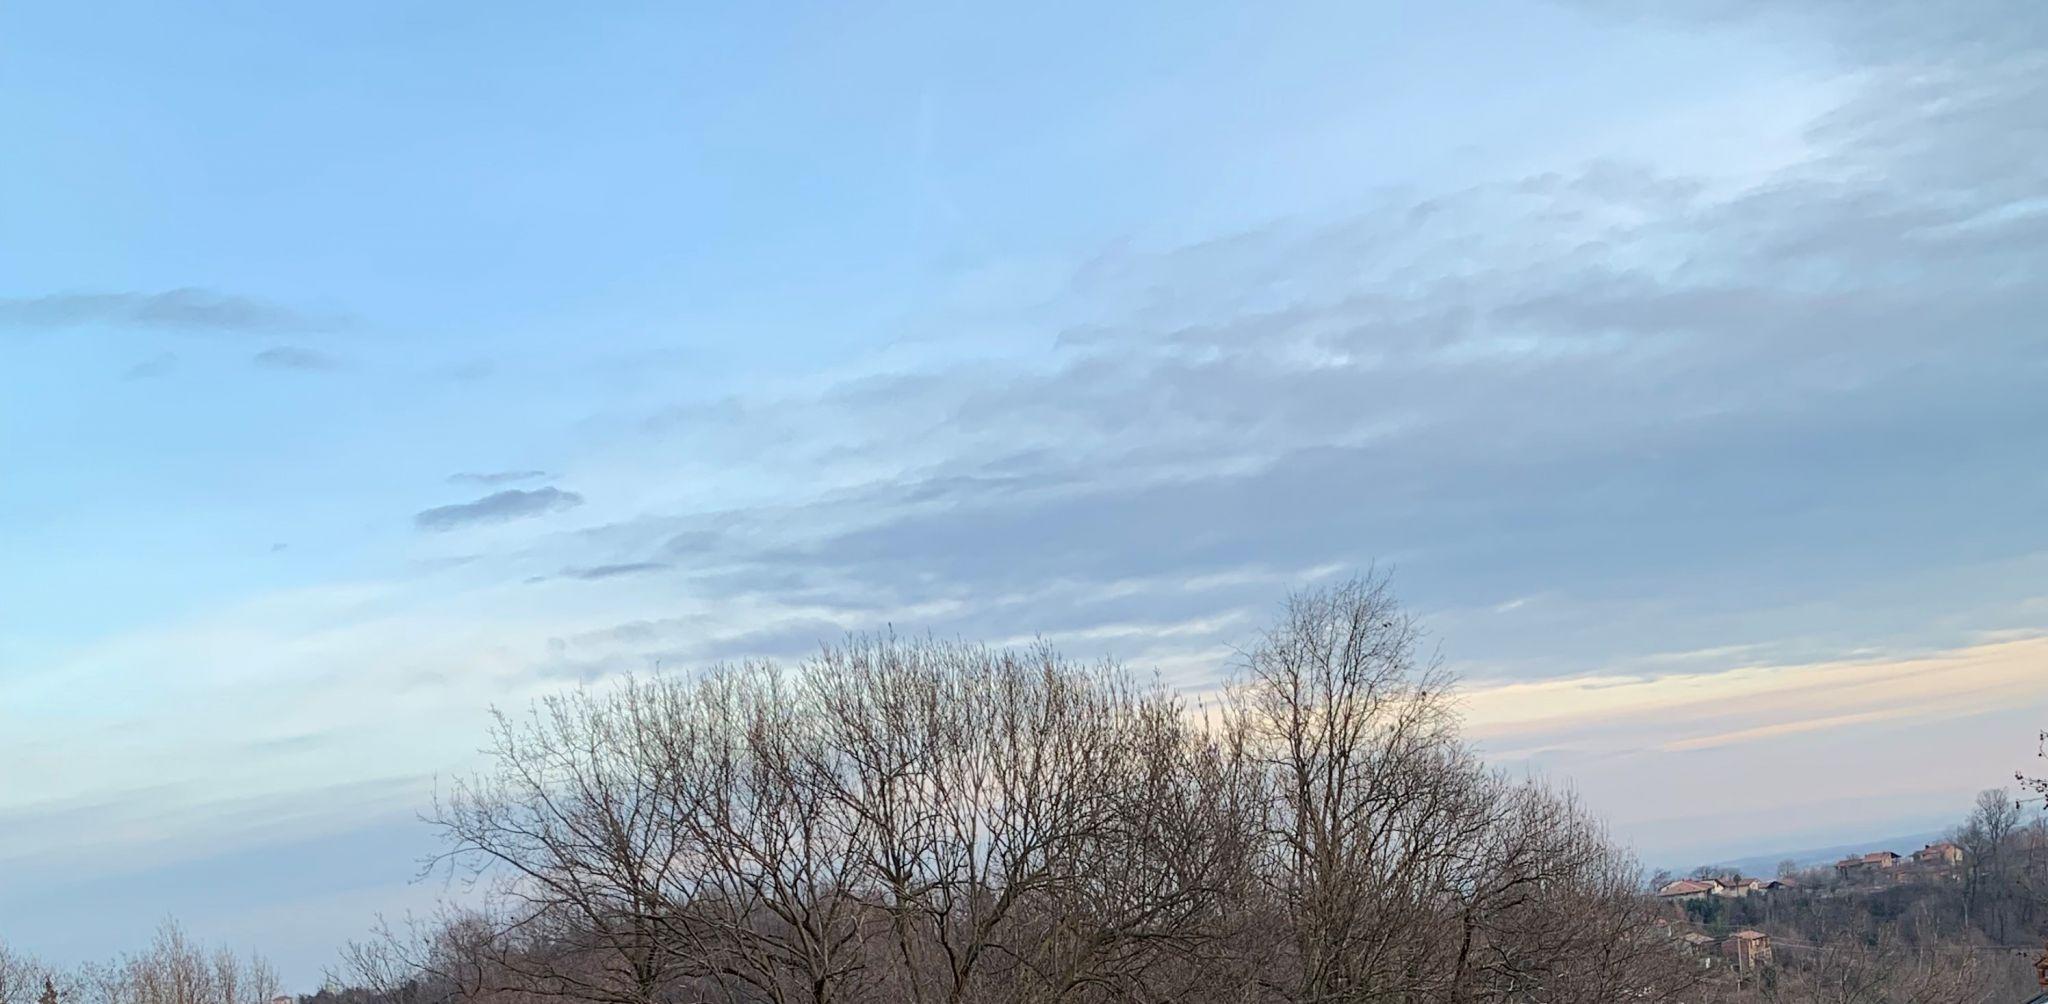 iPhone XR camera sky